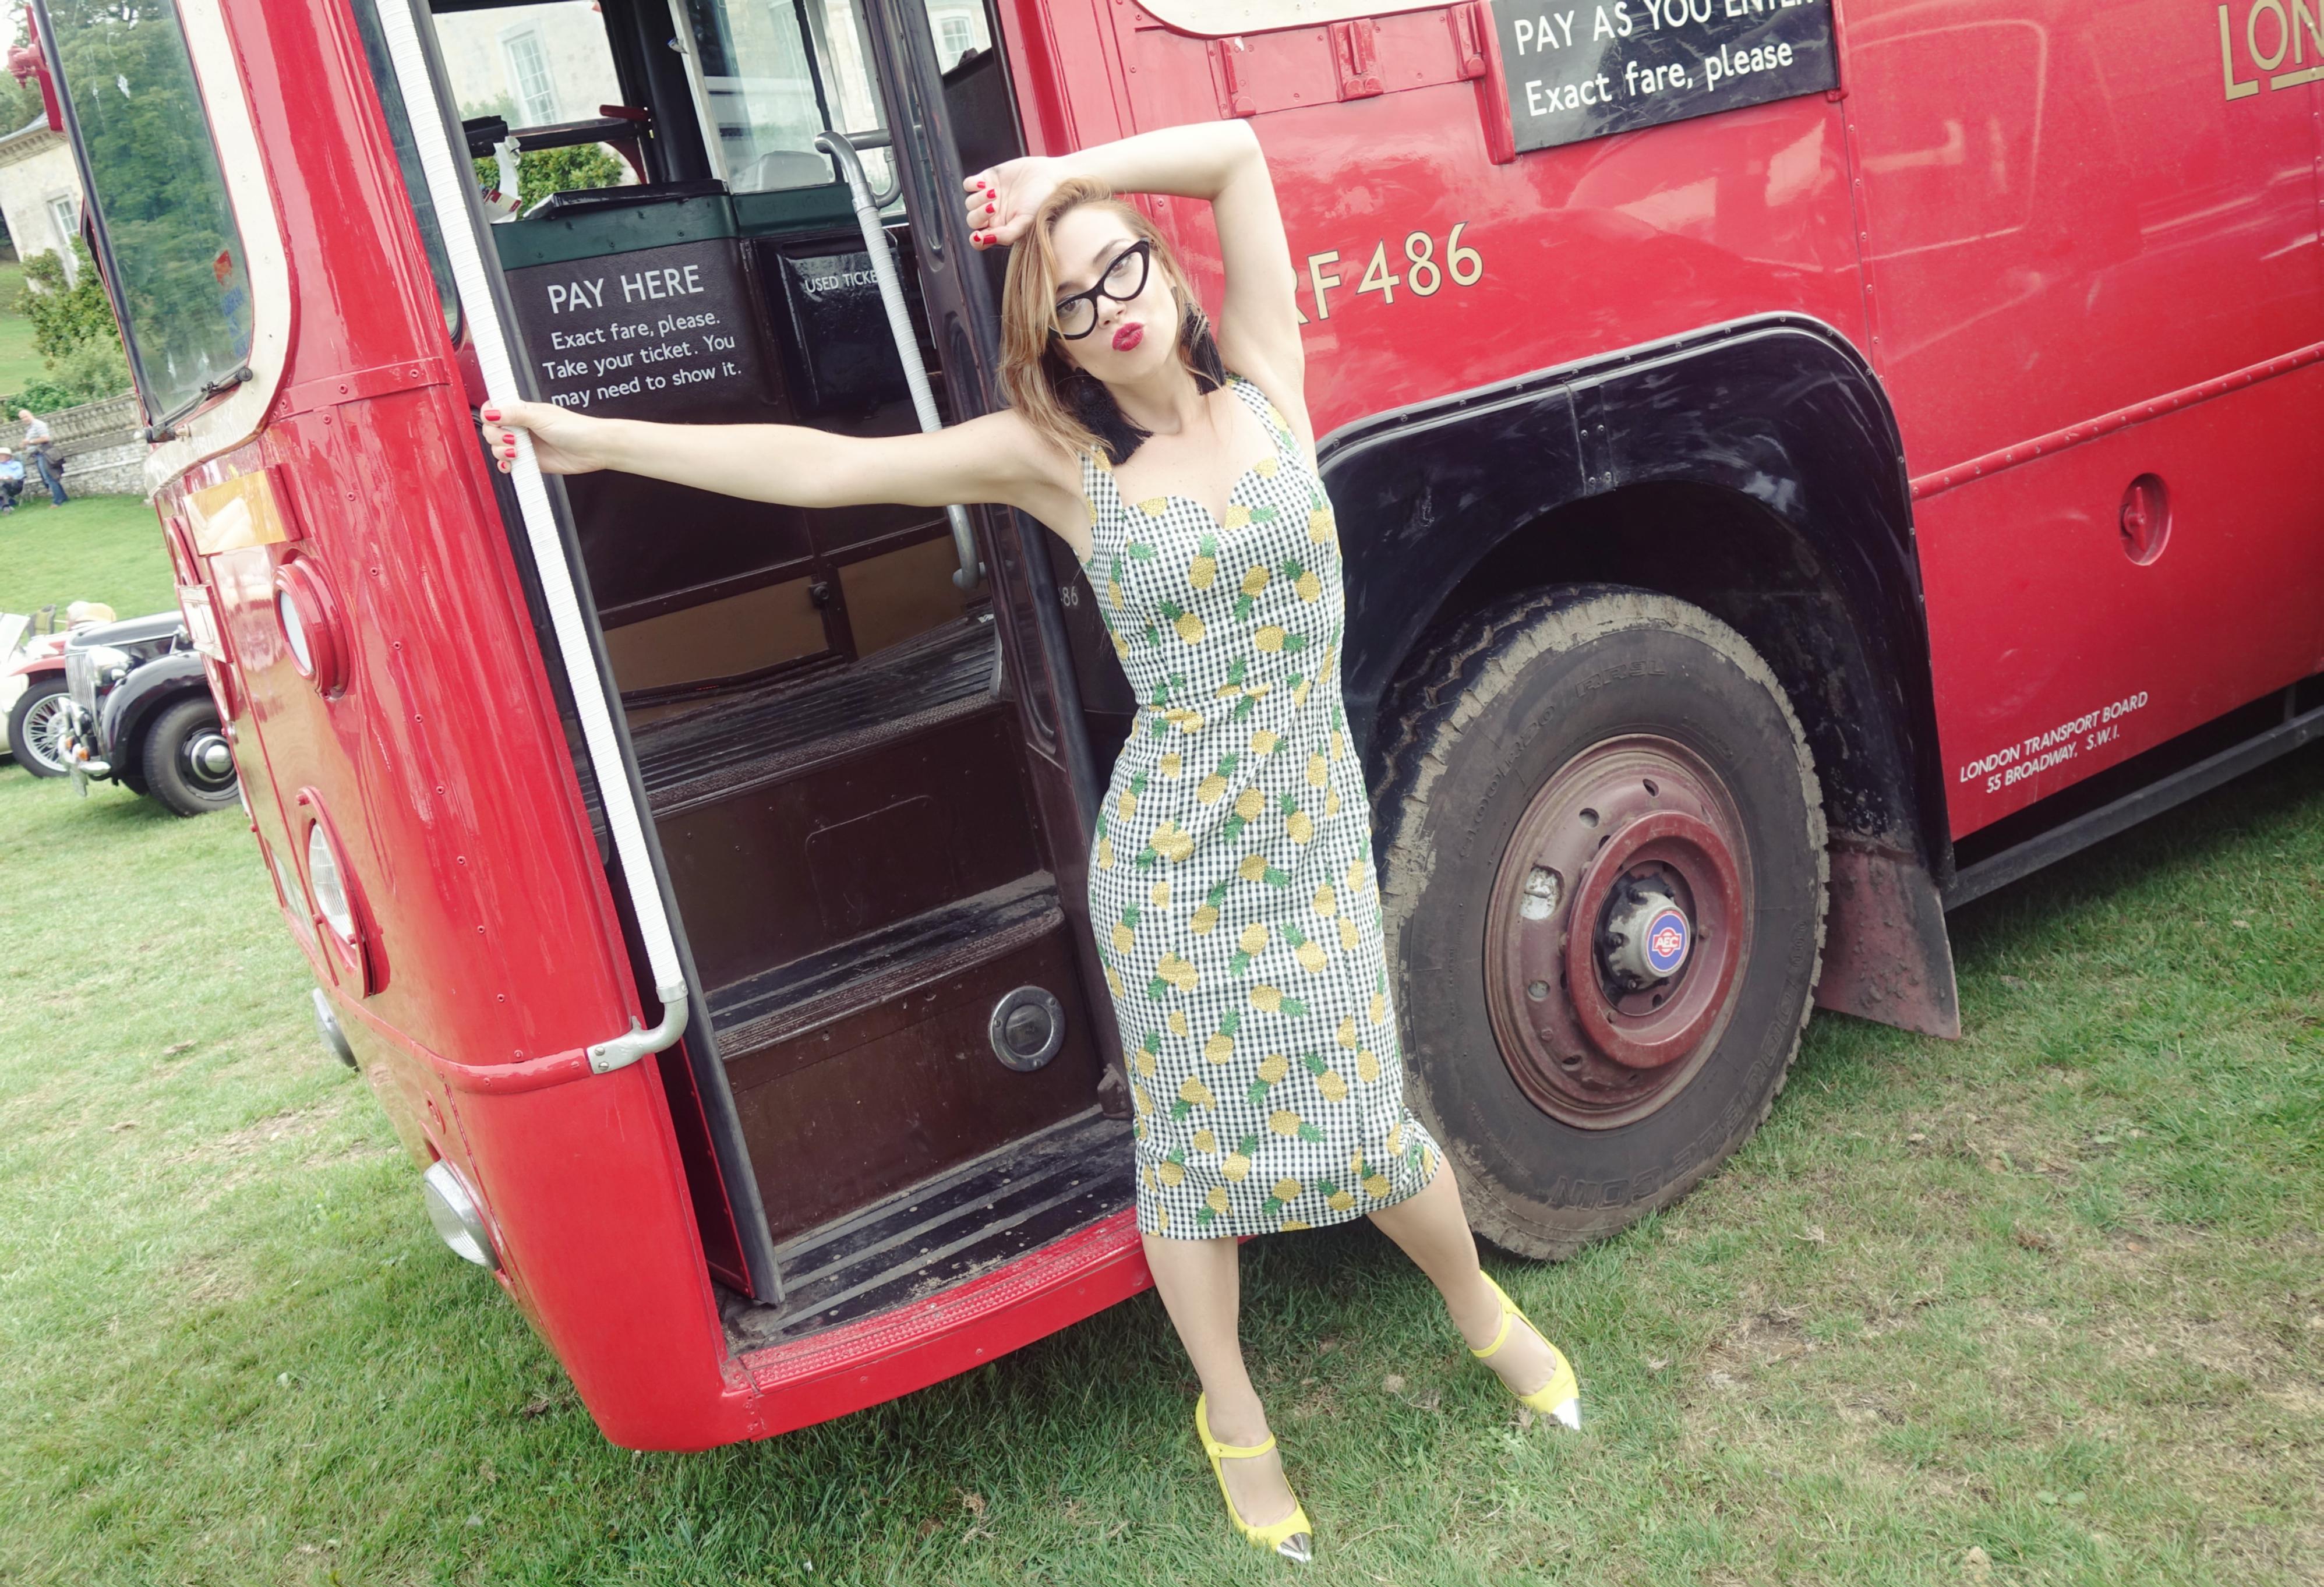 London-style-Firle-Vintage-Fair-ChicAdicta-PiensaenChic-influencer-collectif-dress-look-anos-50-Chic-adicta-Piensa-en-Chic-blog-de-moda